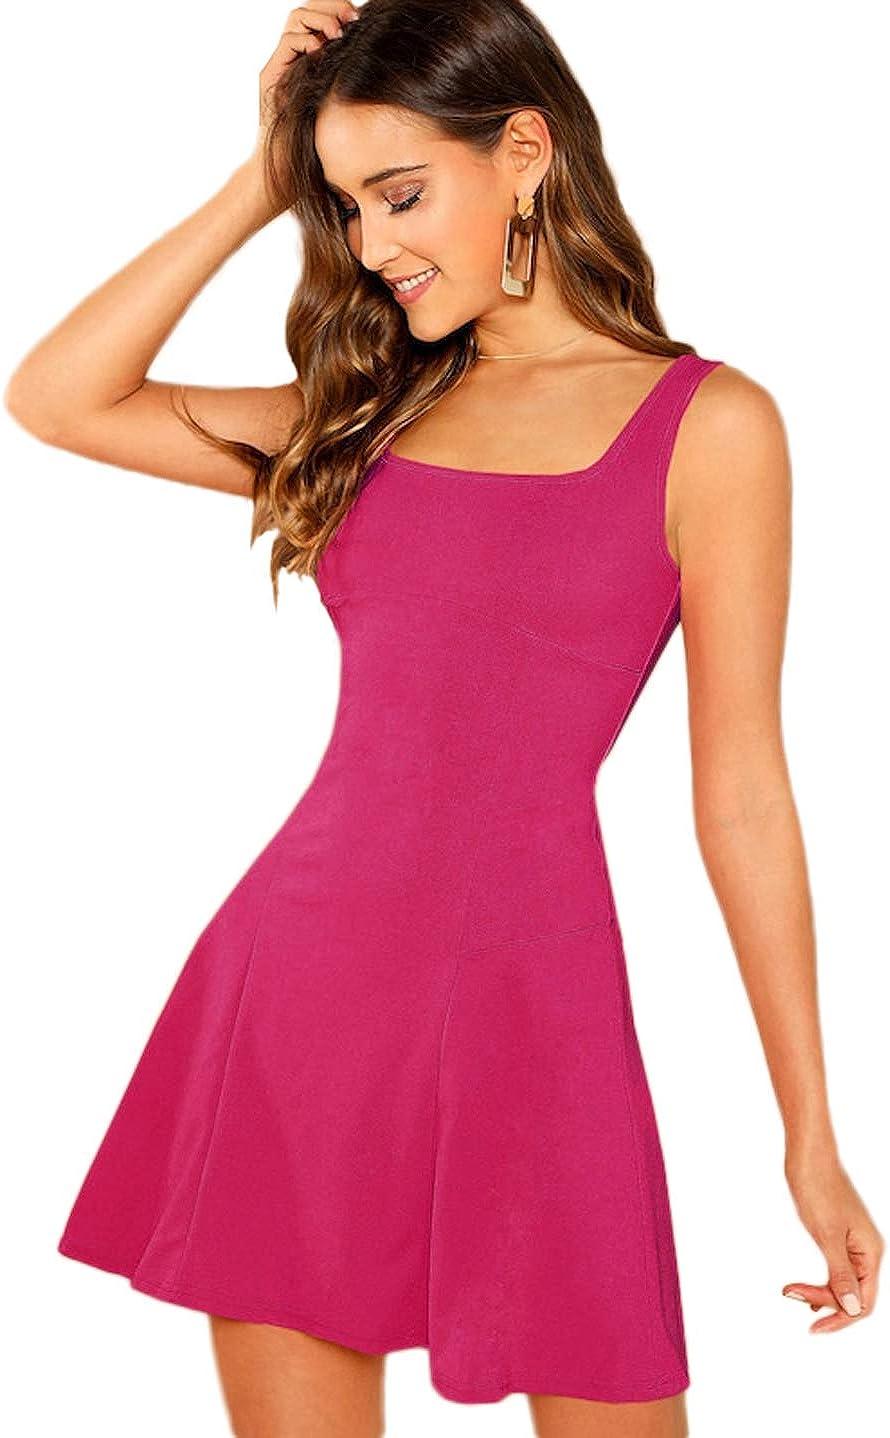 Romwe Women's Sleeveless Zipper A Line Party Mini Bodycon Dress